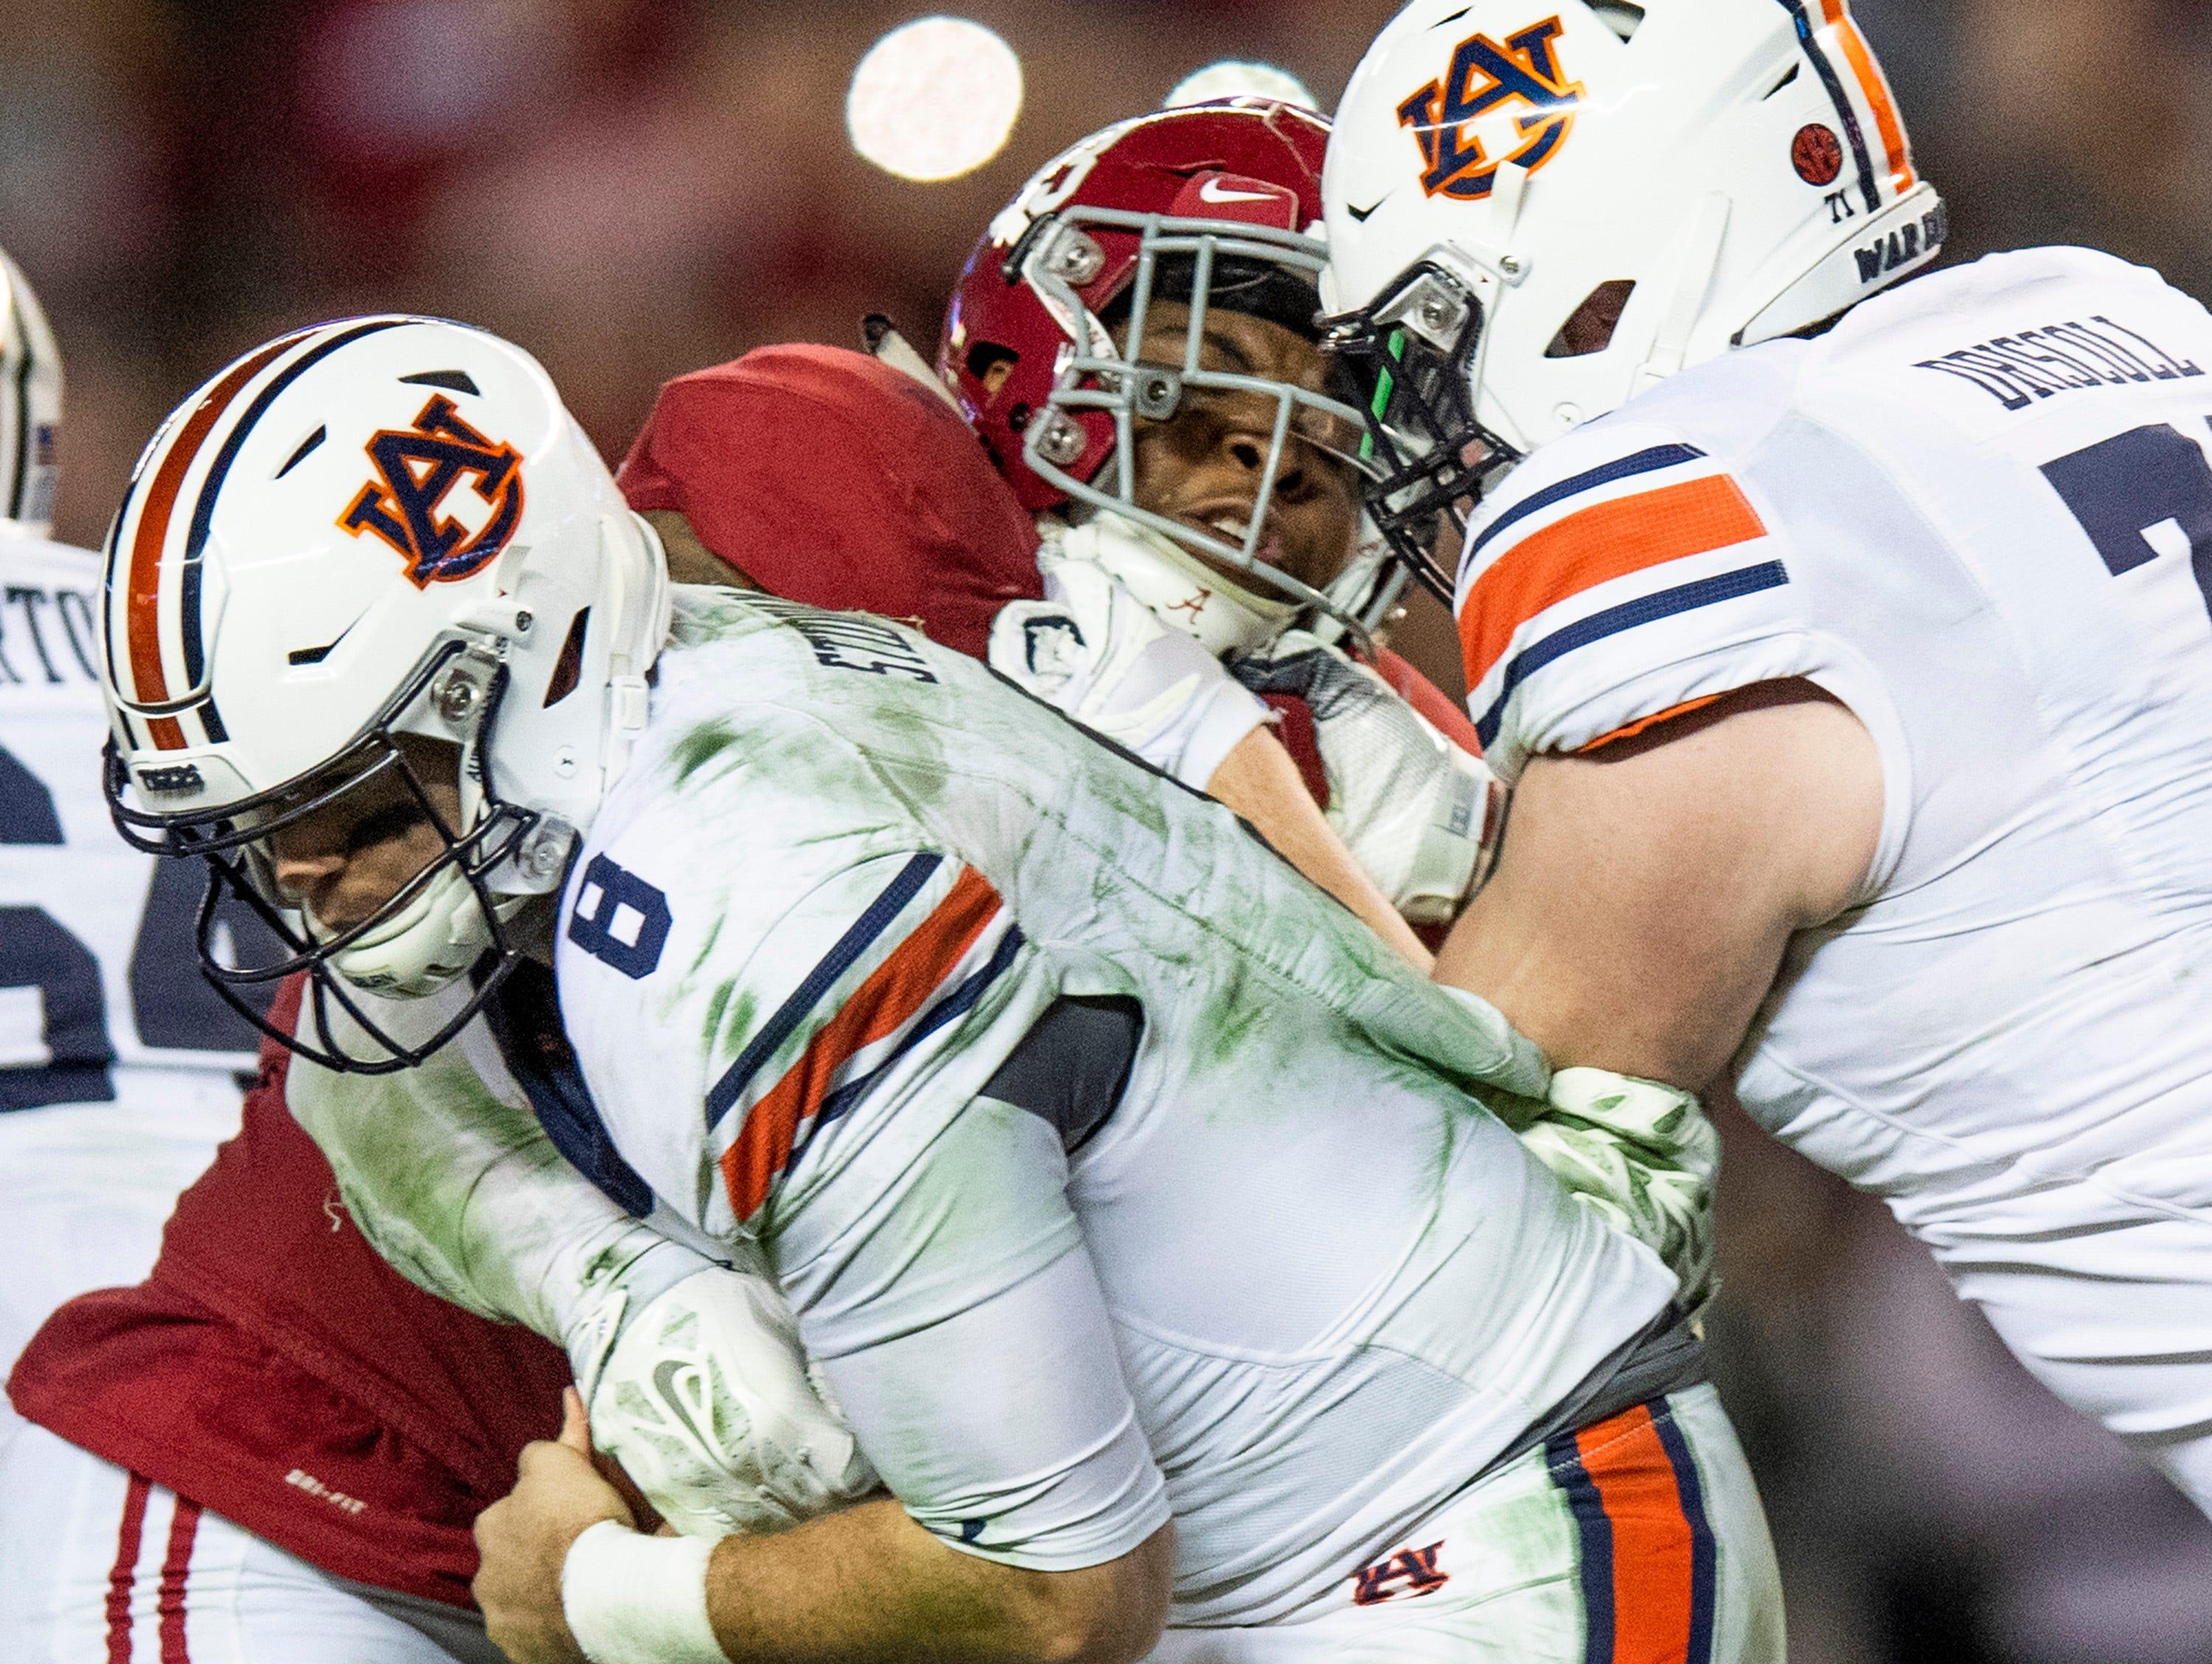 Alabama linebacker Anfernee Jennings (33) sacks Auburn quarterback Jarrett Stidham (8) in second half action during the Iron Bowl at Bryant-Denny Stadium in Tuscaloosa, Ala., on Saturday November 24, 2018.